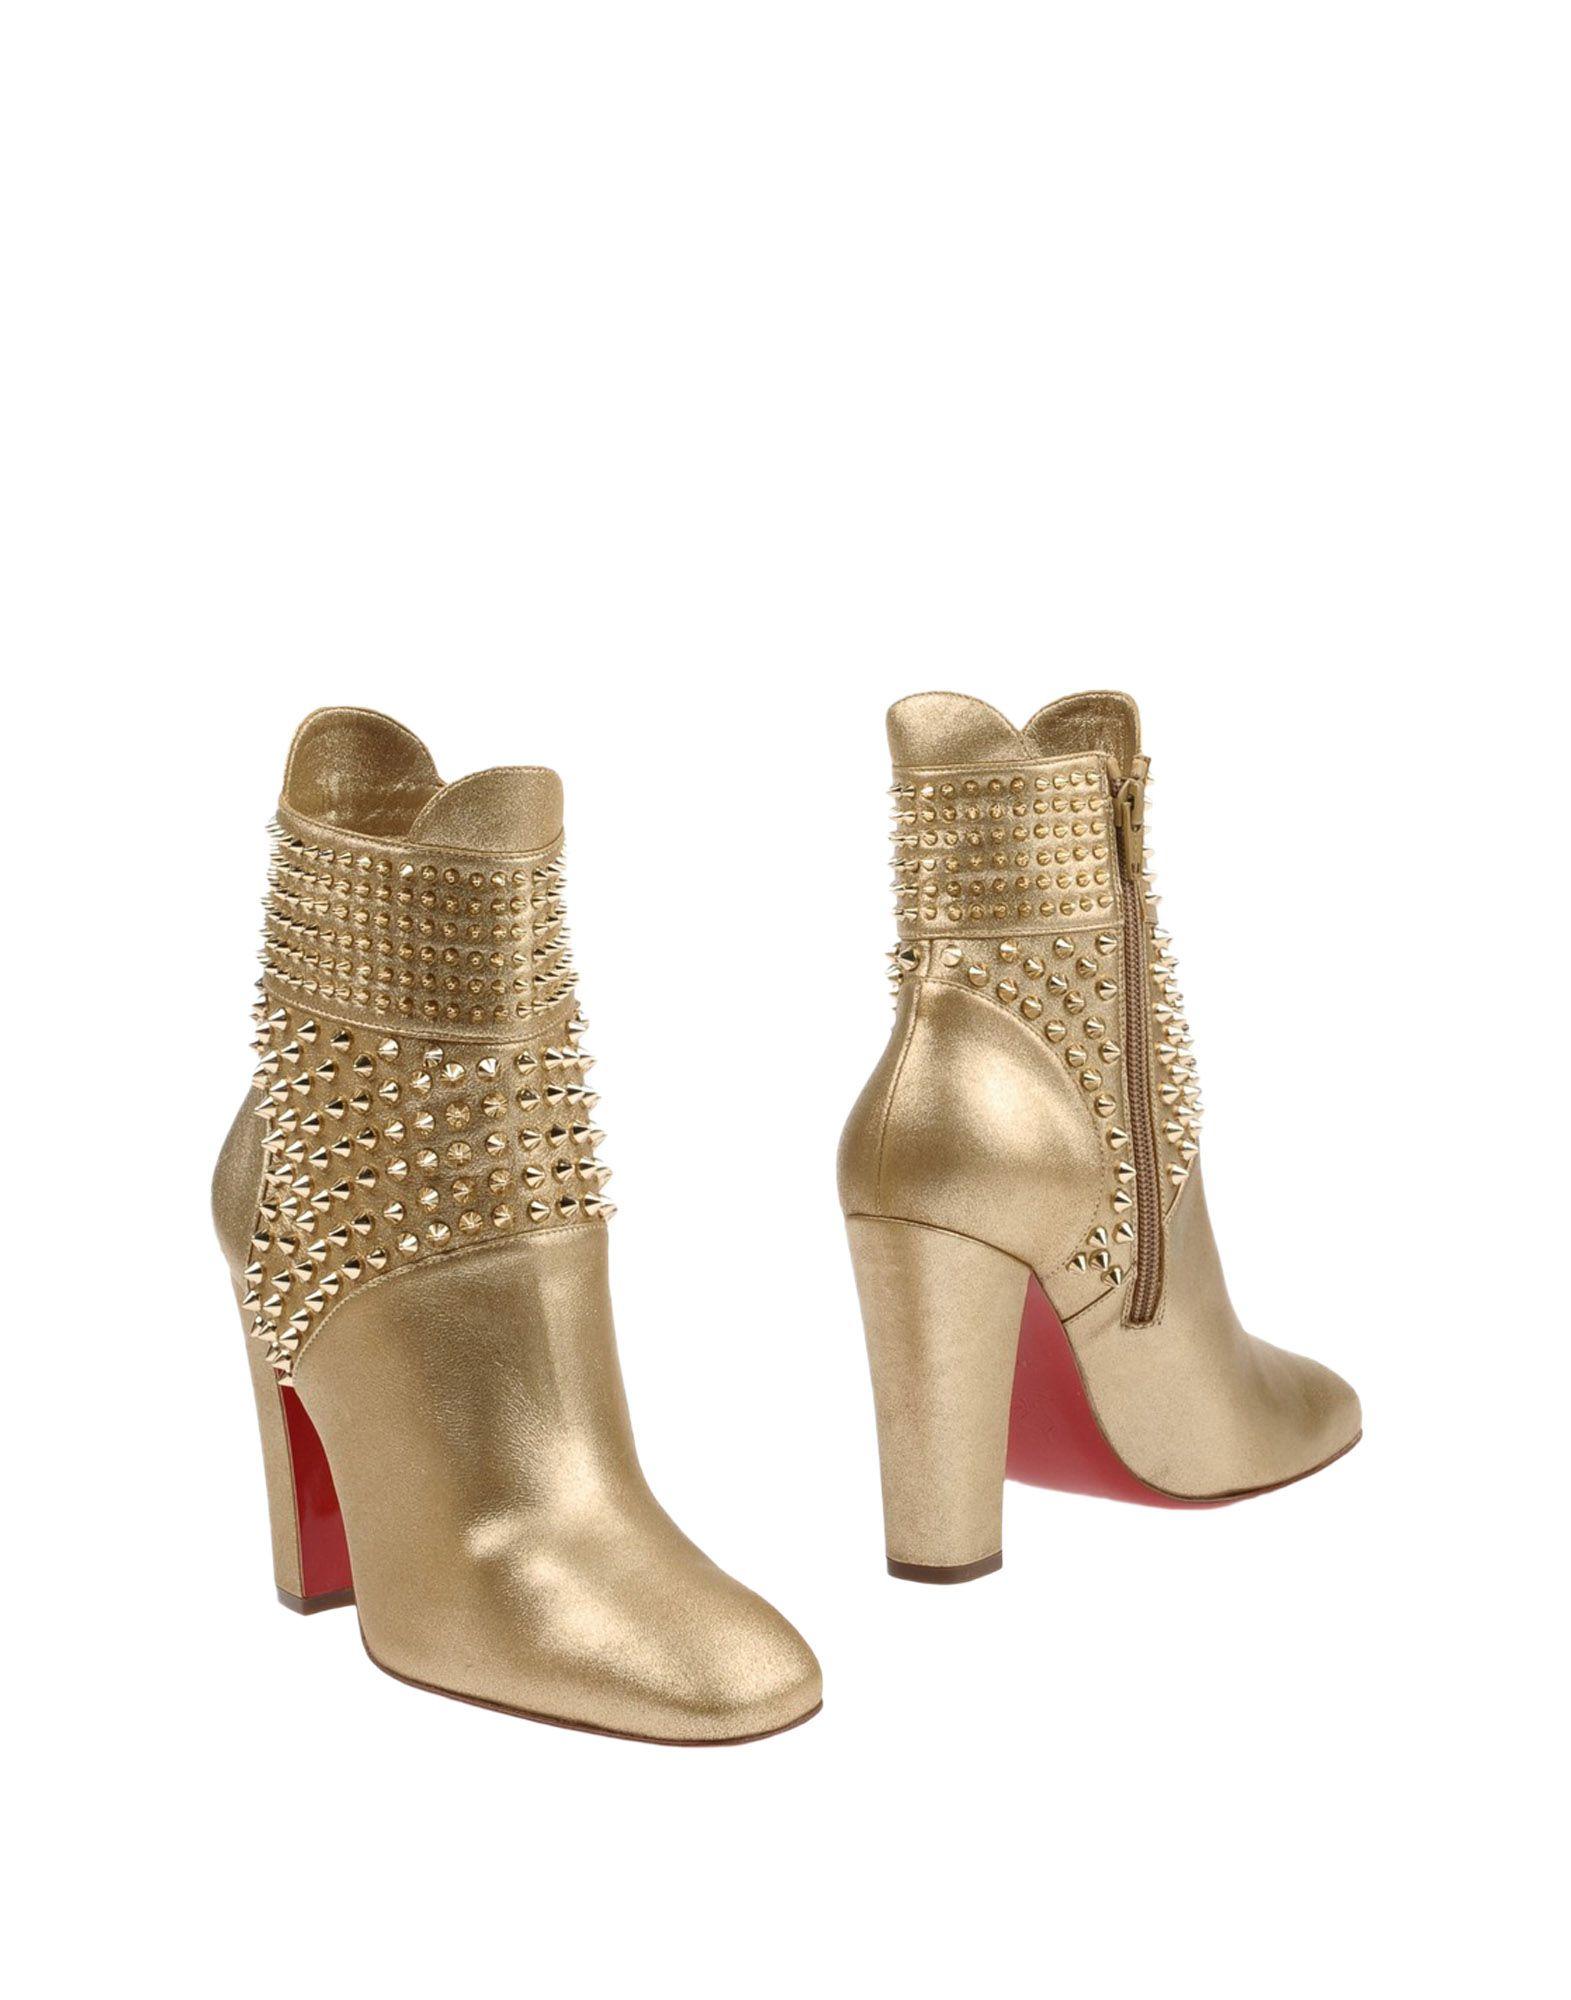 Christian Louboutin Stiefelette Damen  Schuhe 11306600LRGünstige gut aussehende Schuhe  93b2c4